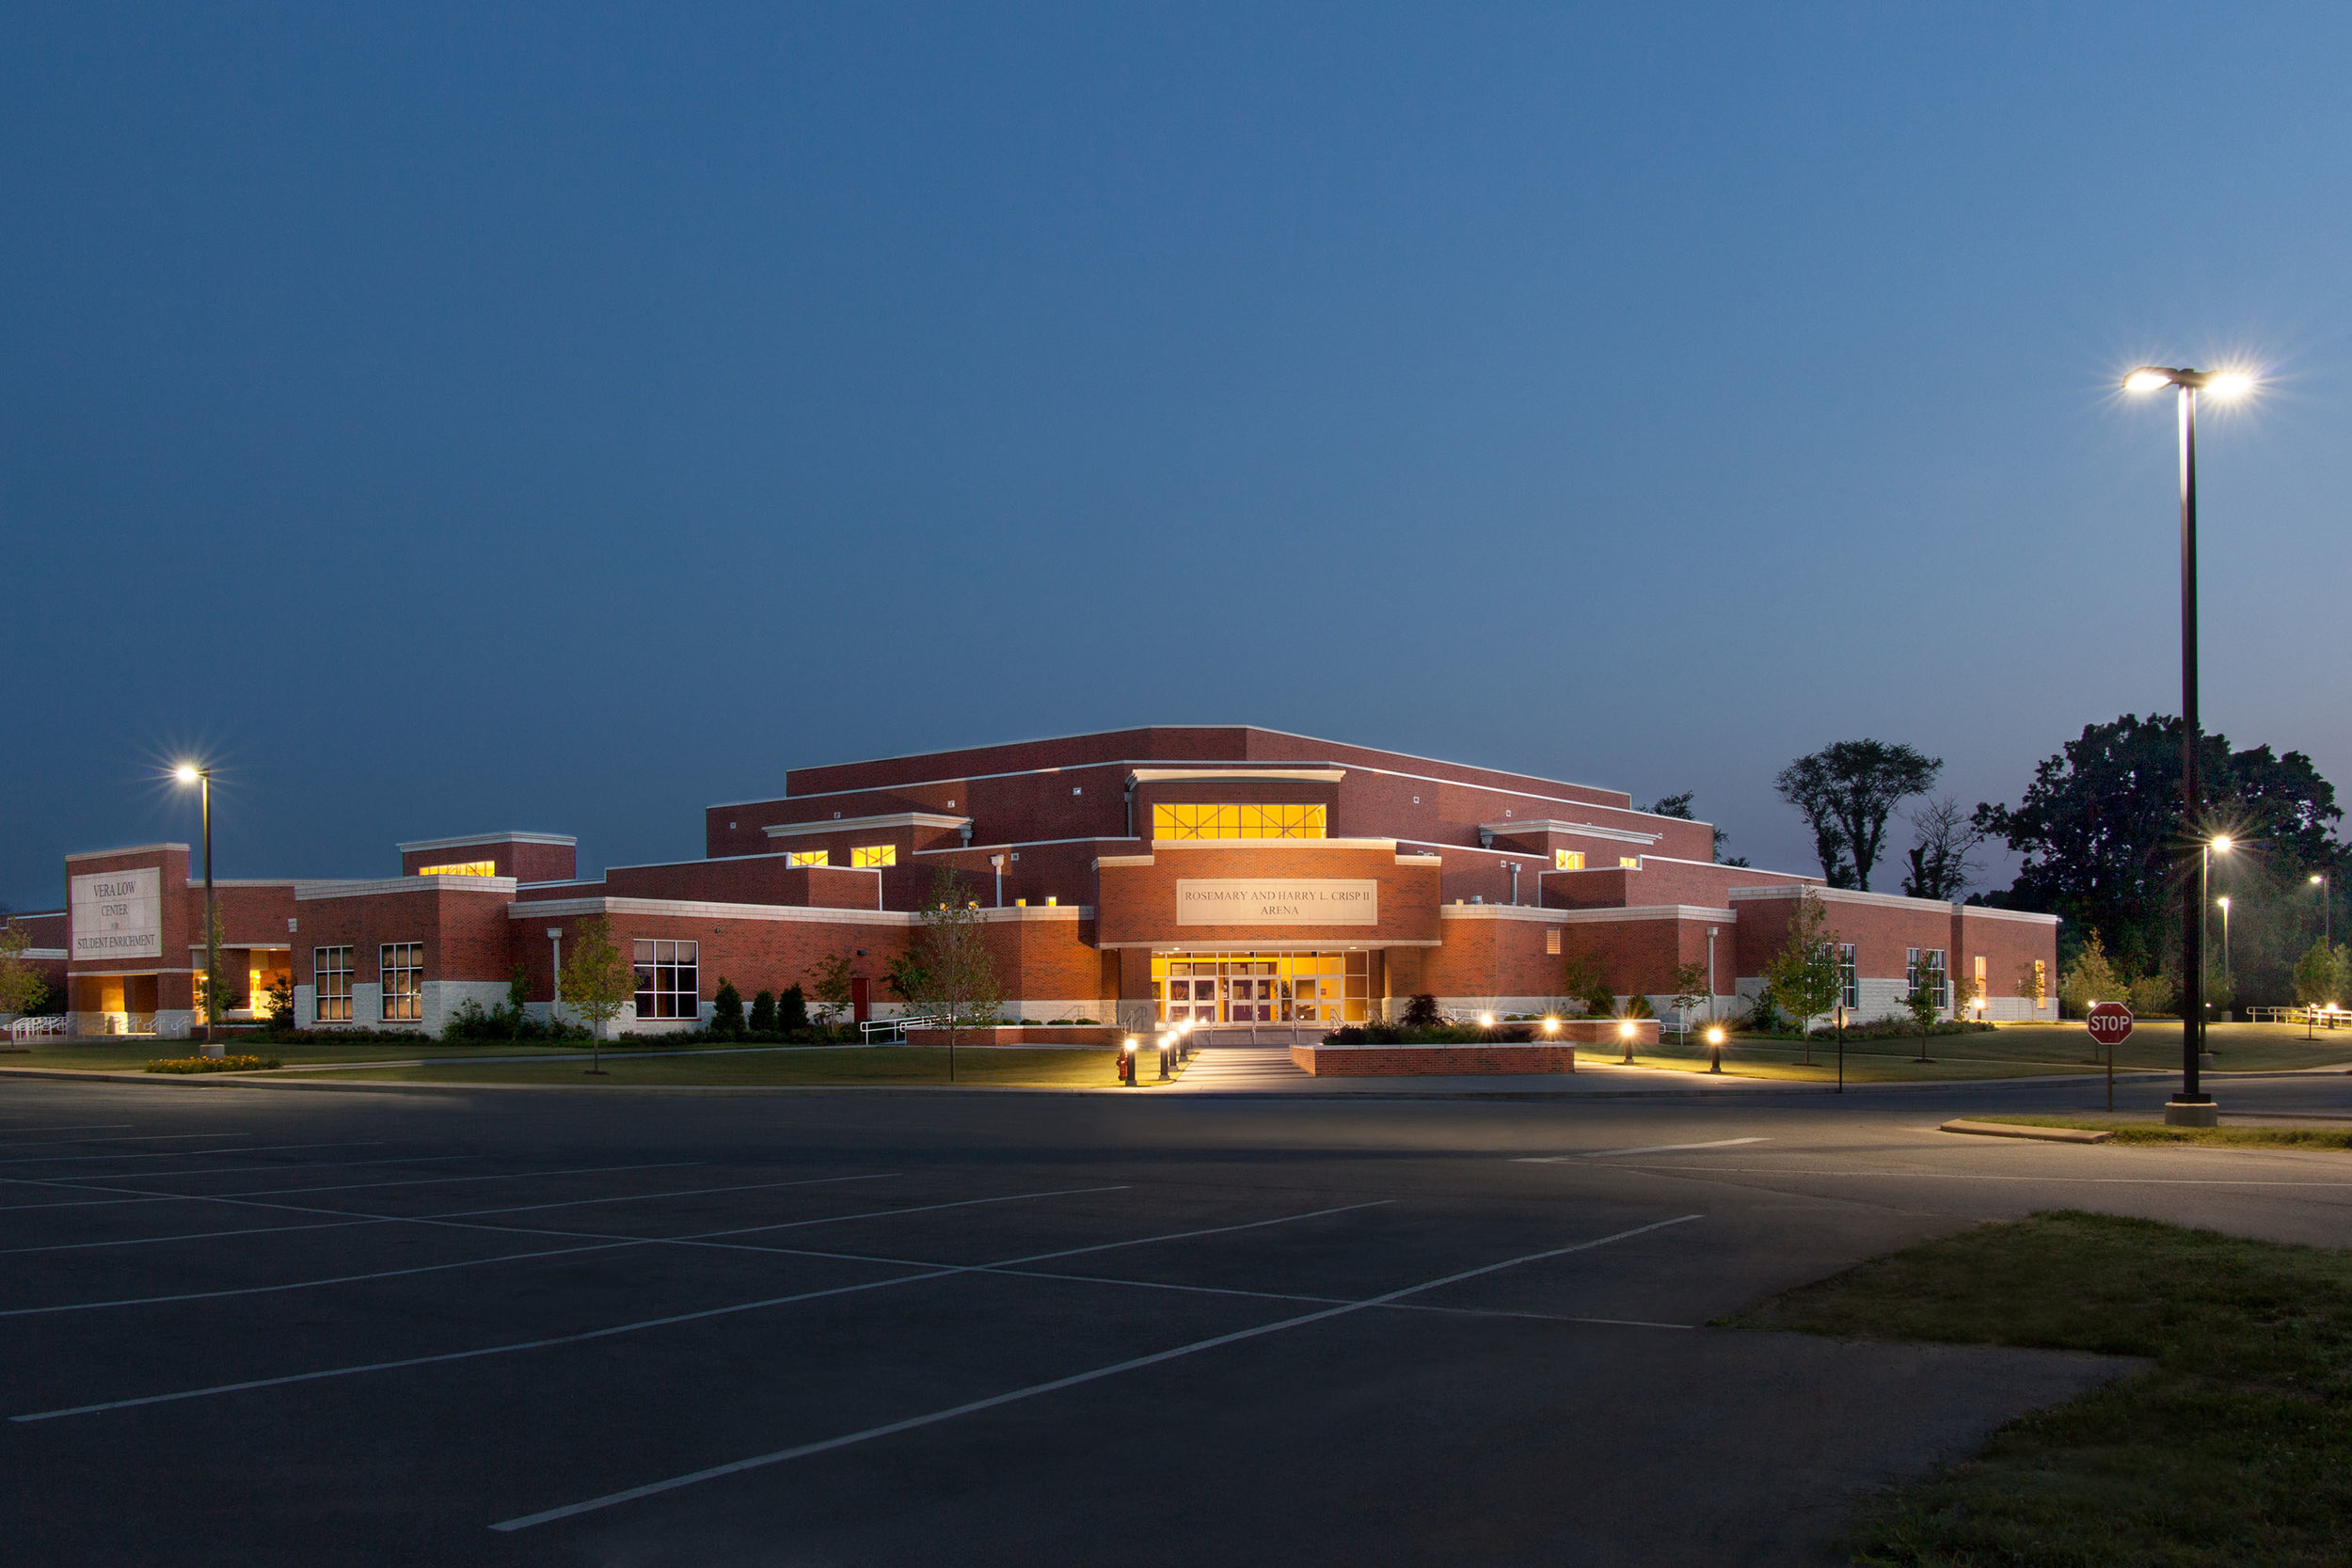 Bethel University Student Center & Arena